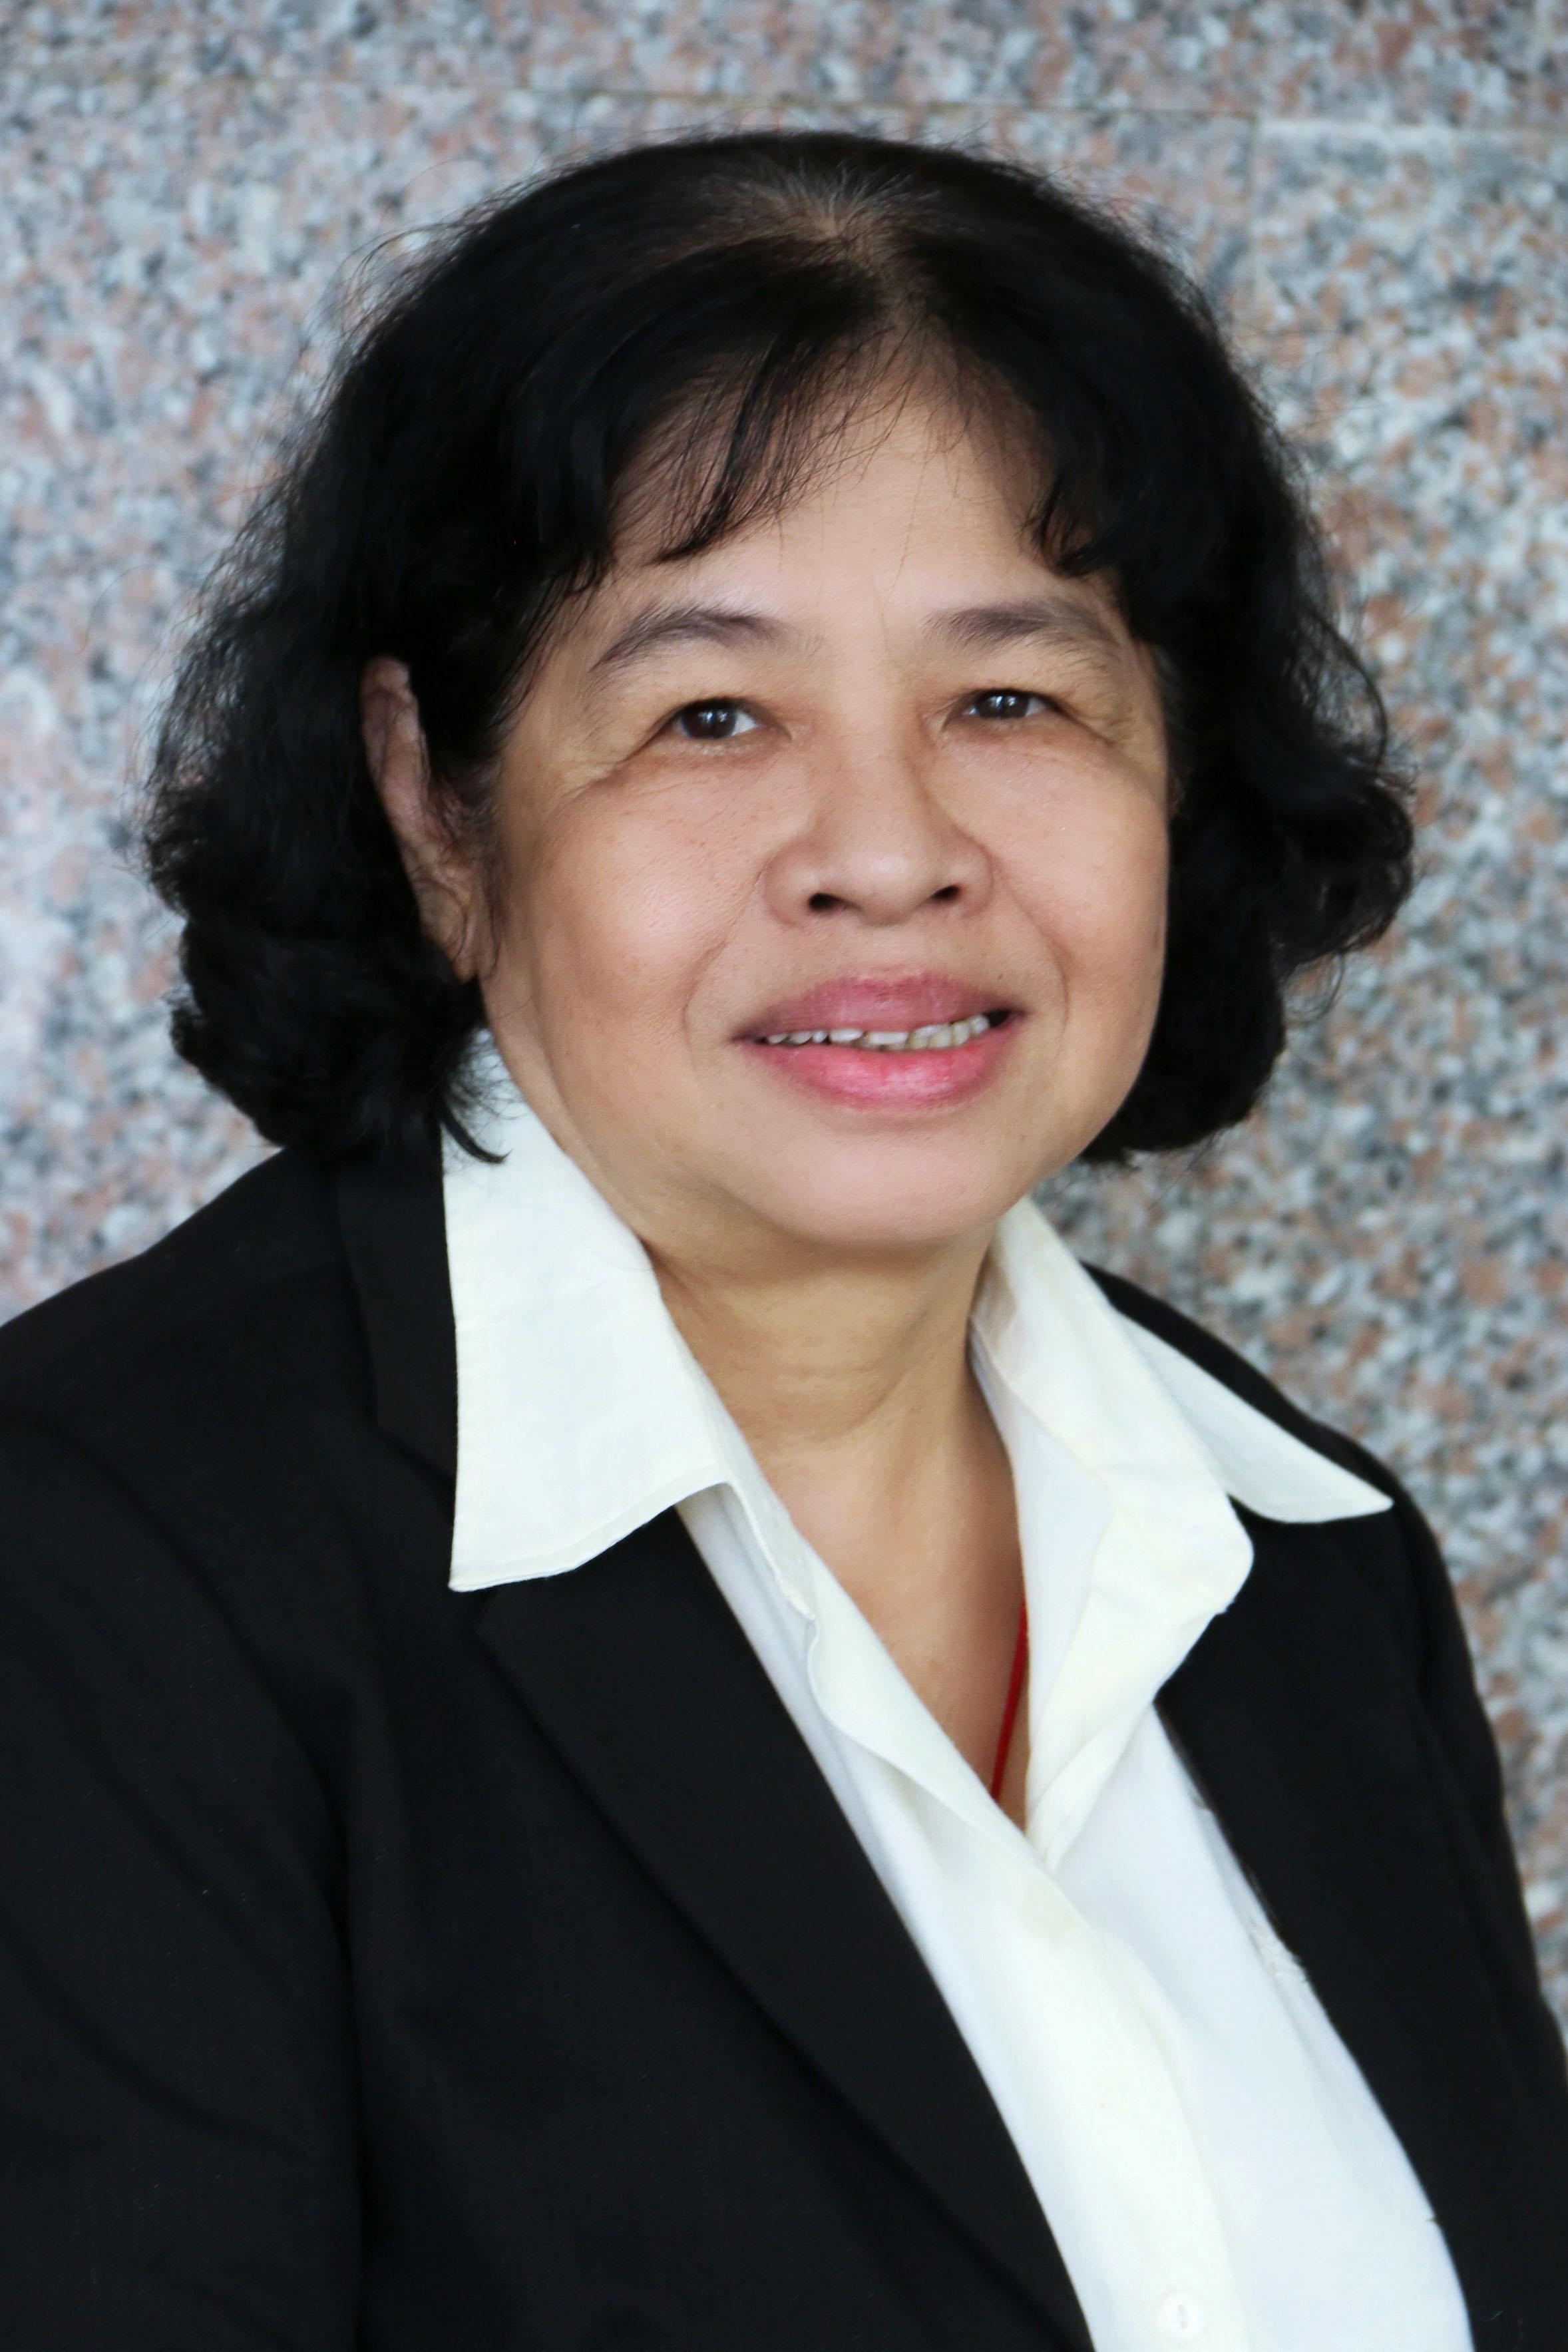 Dr. Pham Kim Phuong